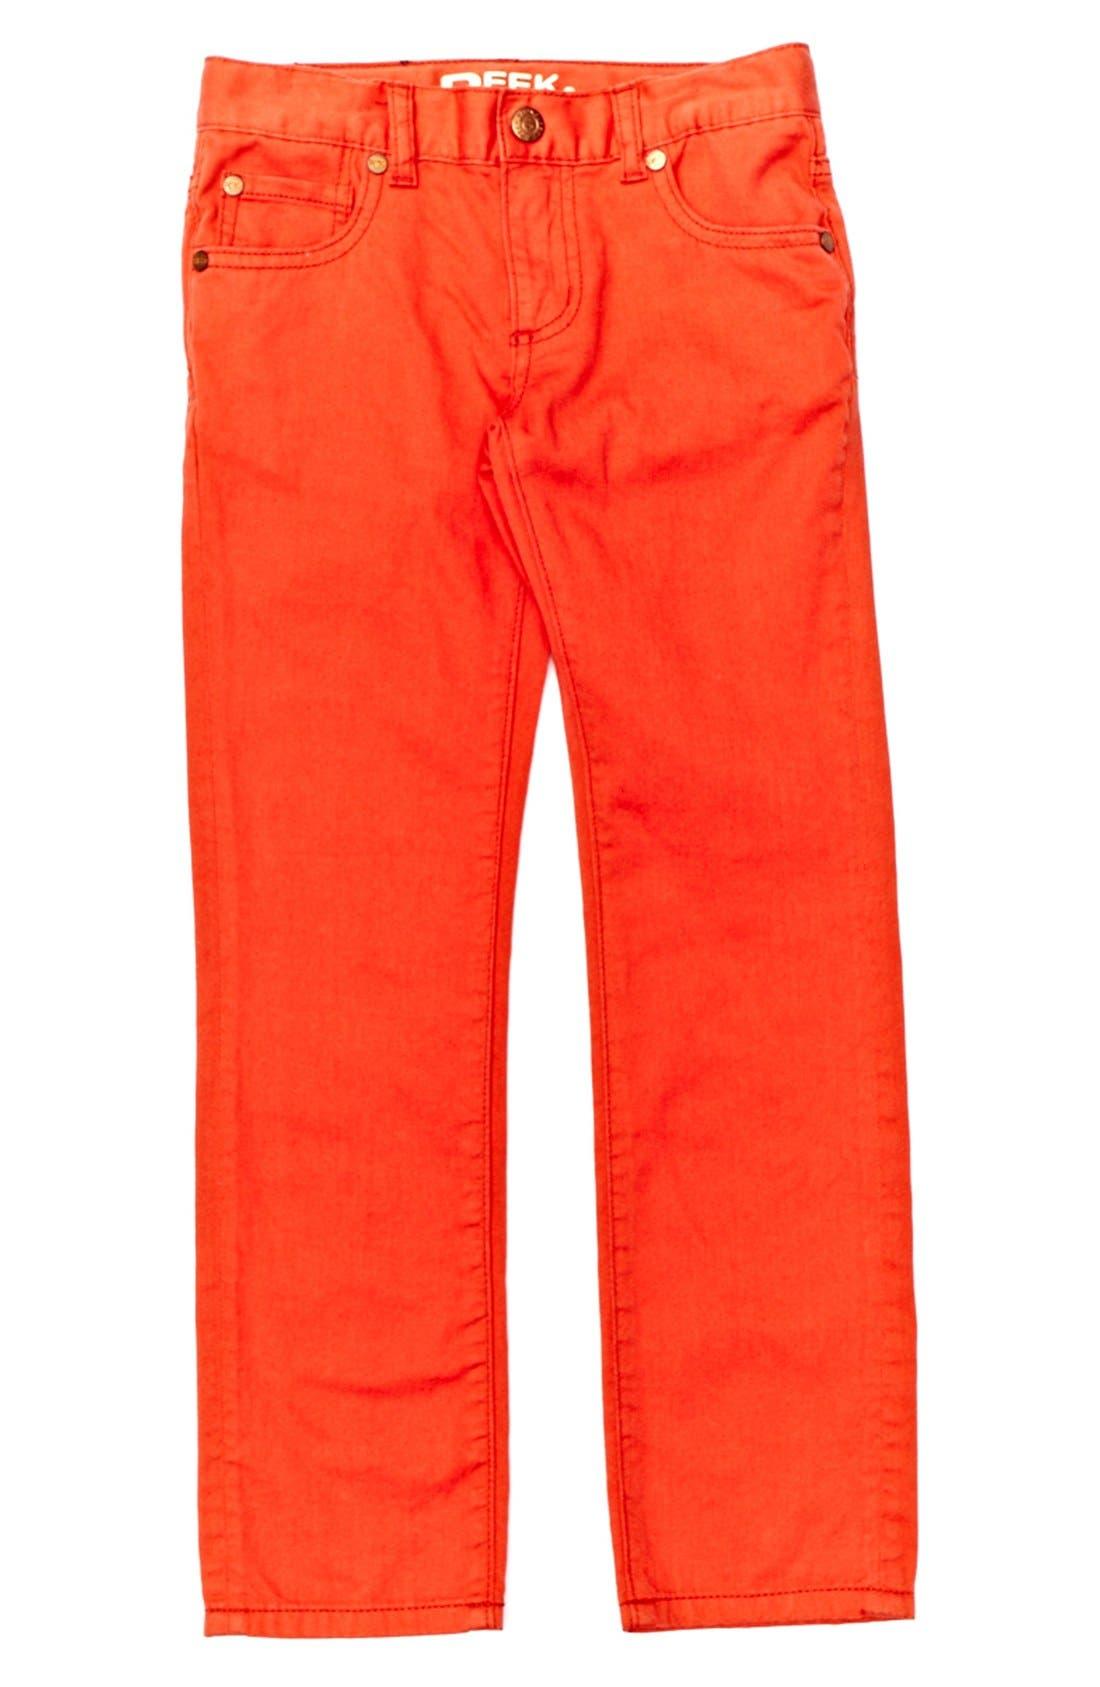 Alternate Image 1 Selected - Peek 'Slouch' Twill Jeans (Toddler Boys, Little Boys & Big Boys)